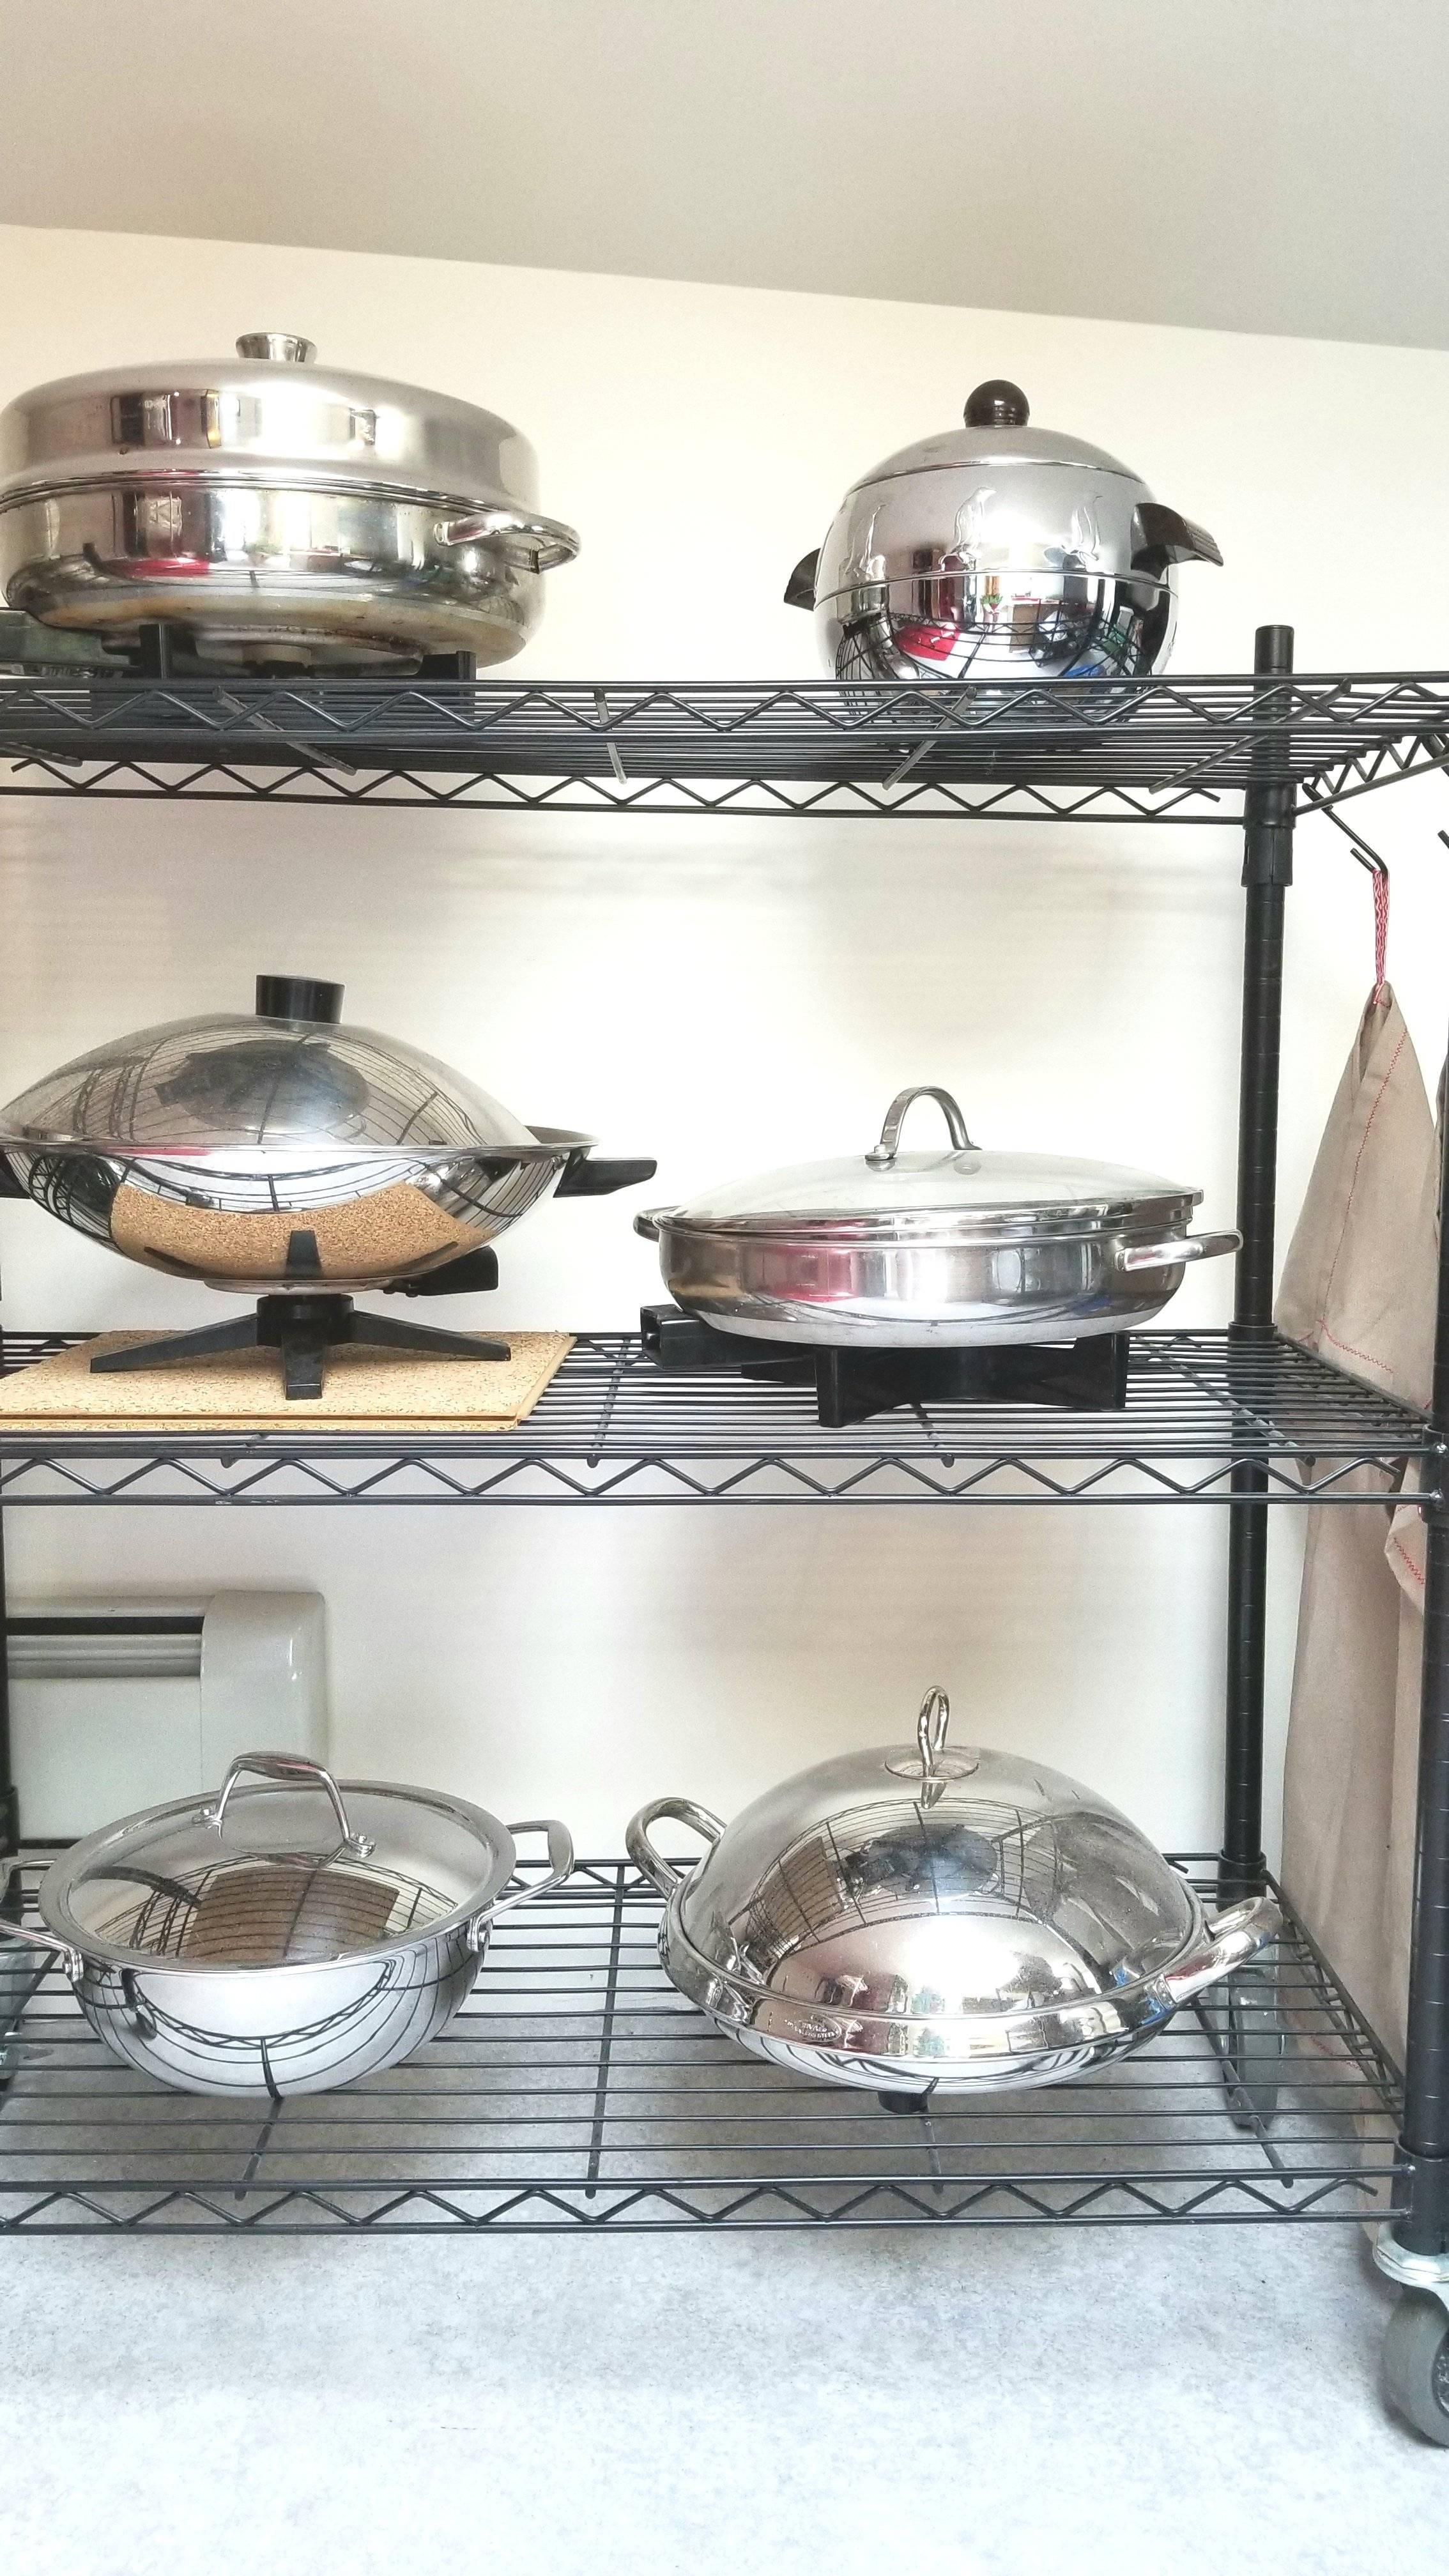 Extra Kitchenware